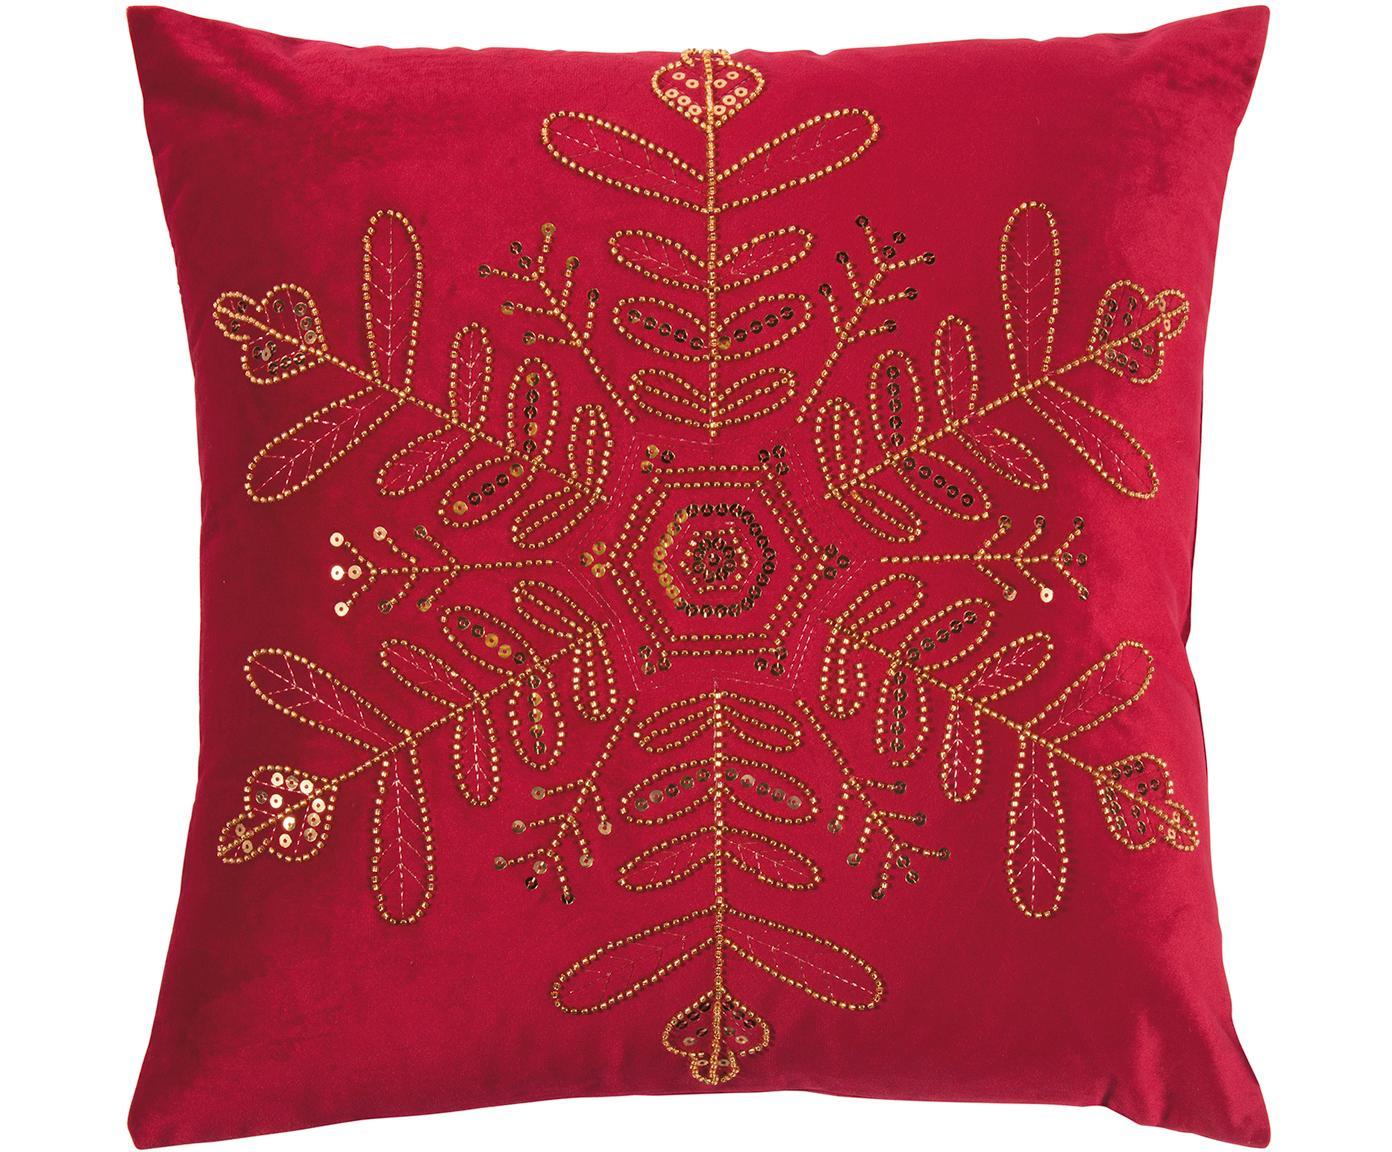 Samt-Kissenhülle Sparkle mit besticktem Perlen-Motiv, Polyestersamt, Rot, Goldfarben, 45 x 45 cm